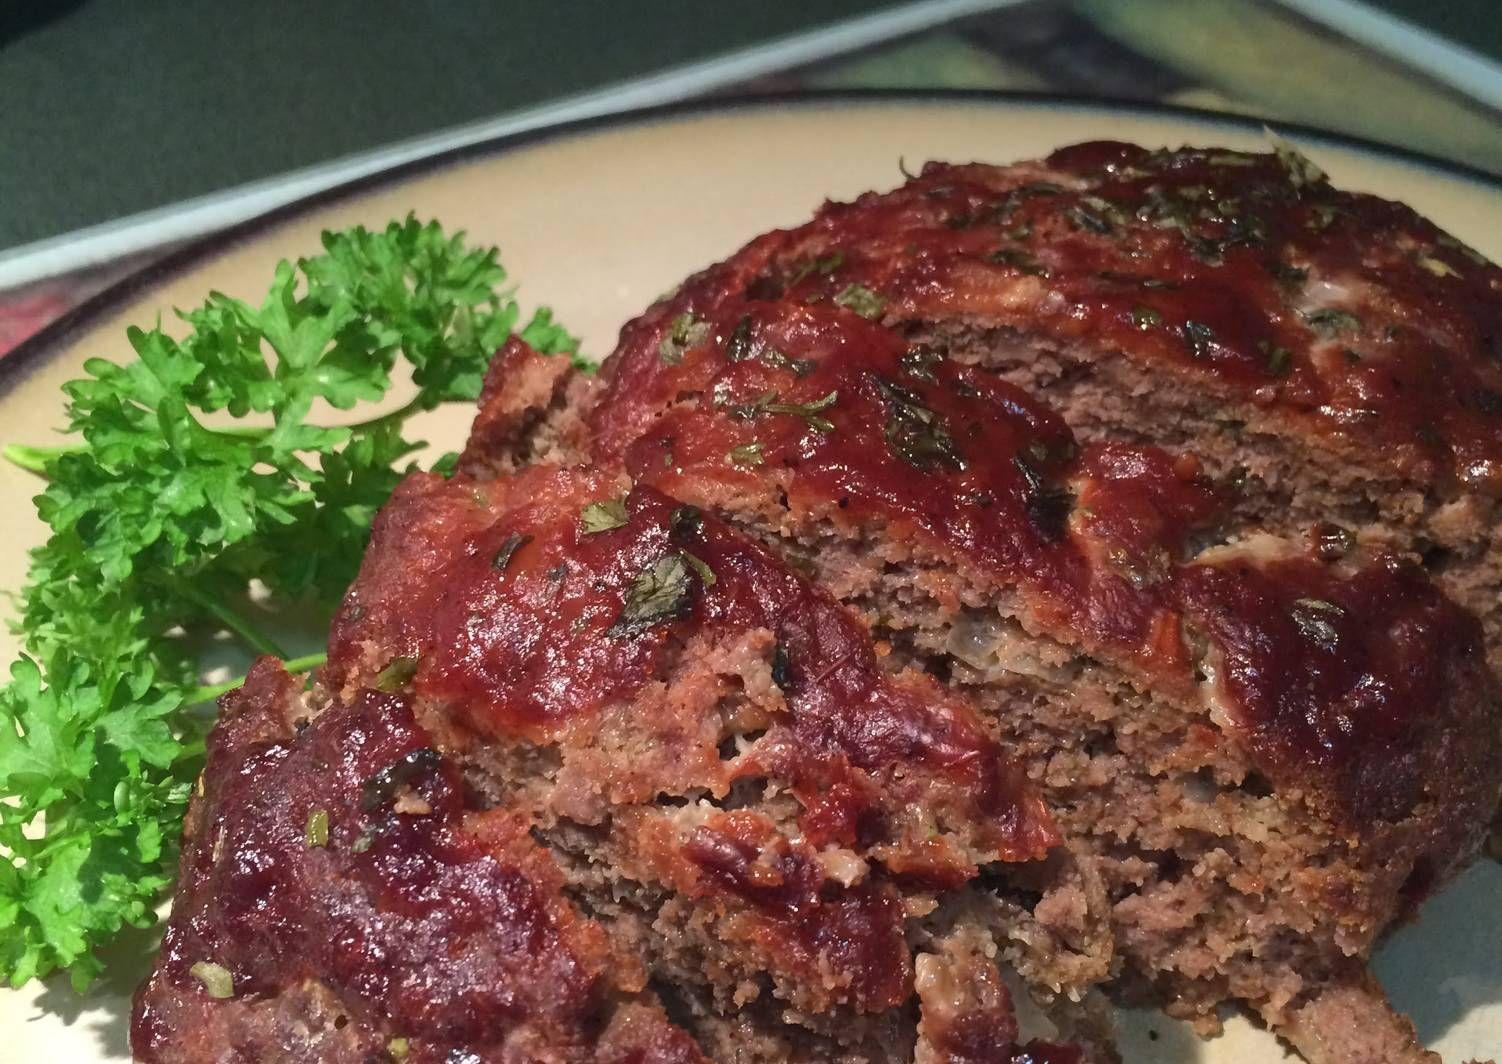 Barbecue Bison Meatloaf Recipe By Cooljewel Recipe Bison Meatloaf Recipe Bison Meatloaf Bison Recipes